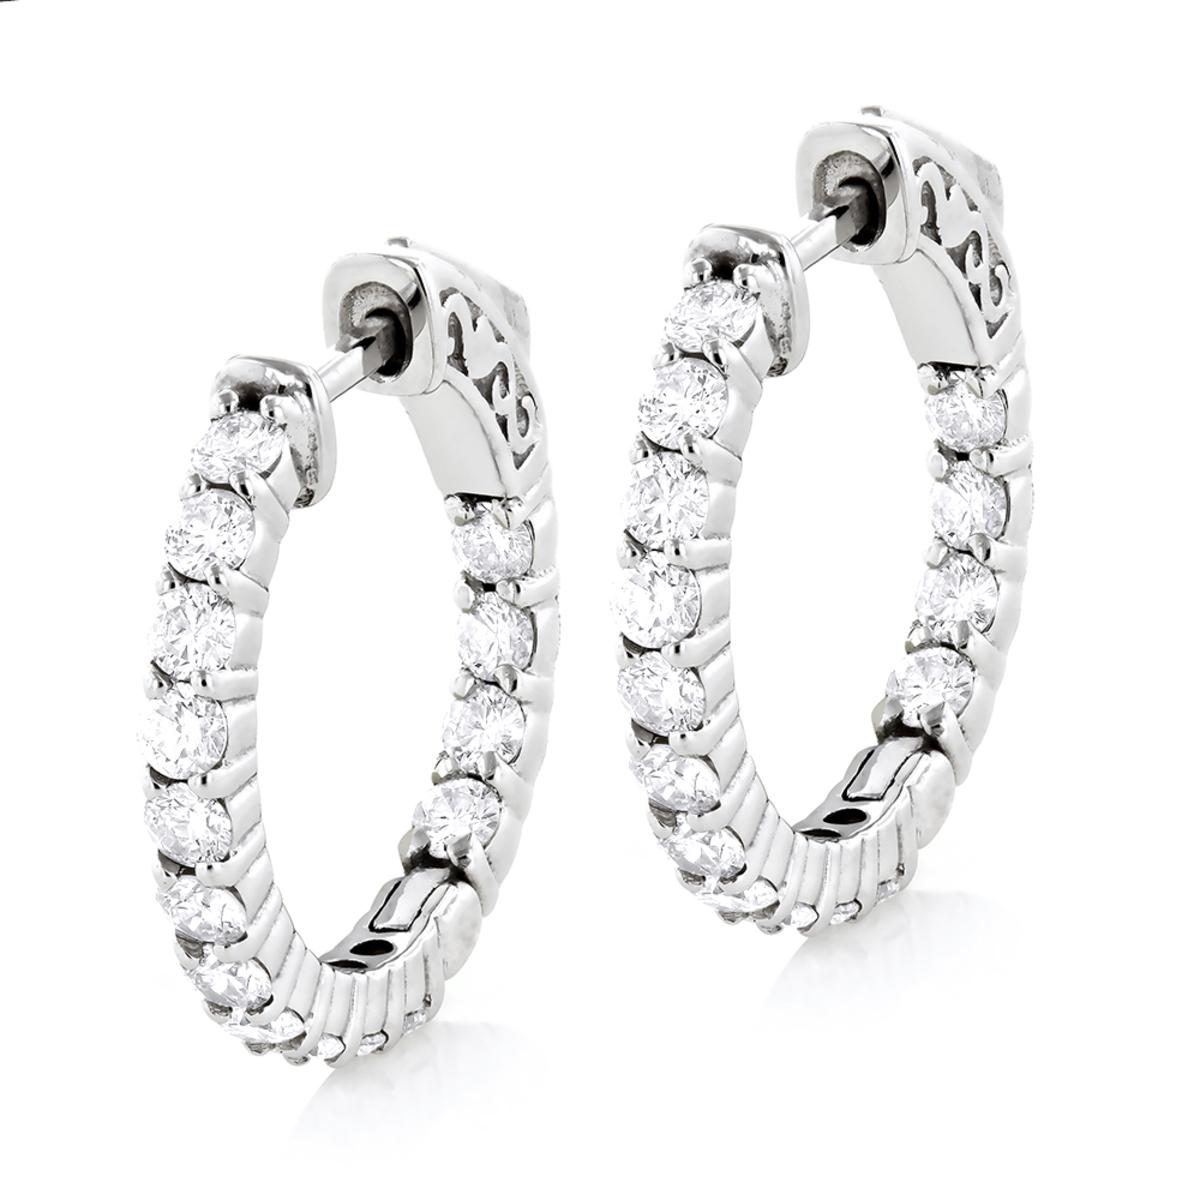 Small 14K Gold Inside Out Diamond Hoop Earrings 1.79ct